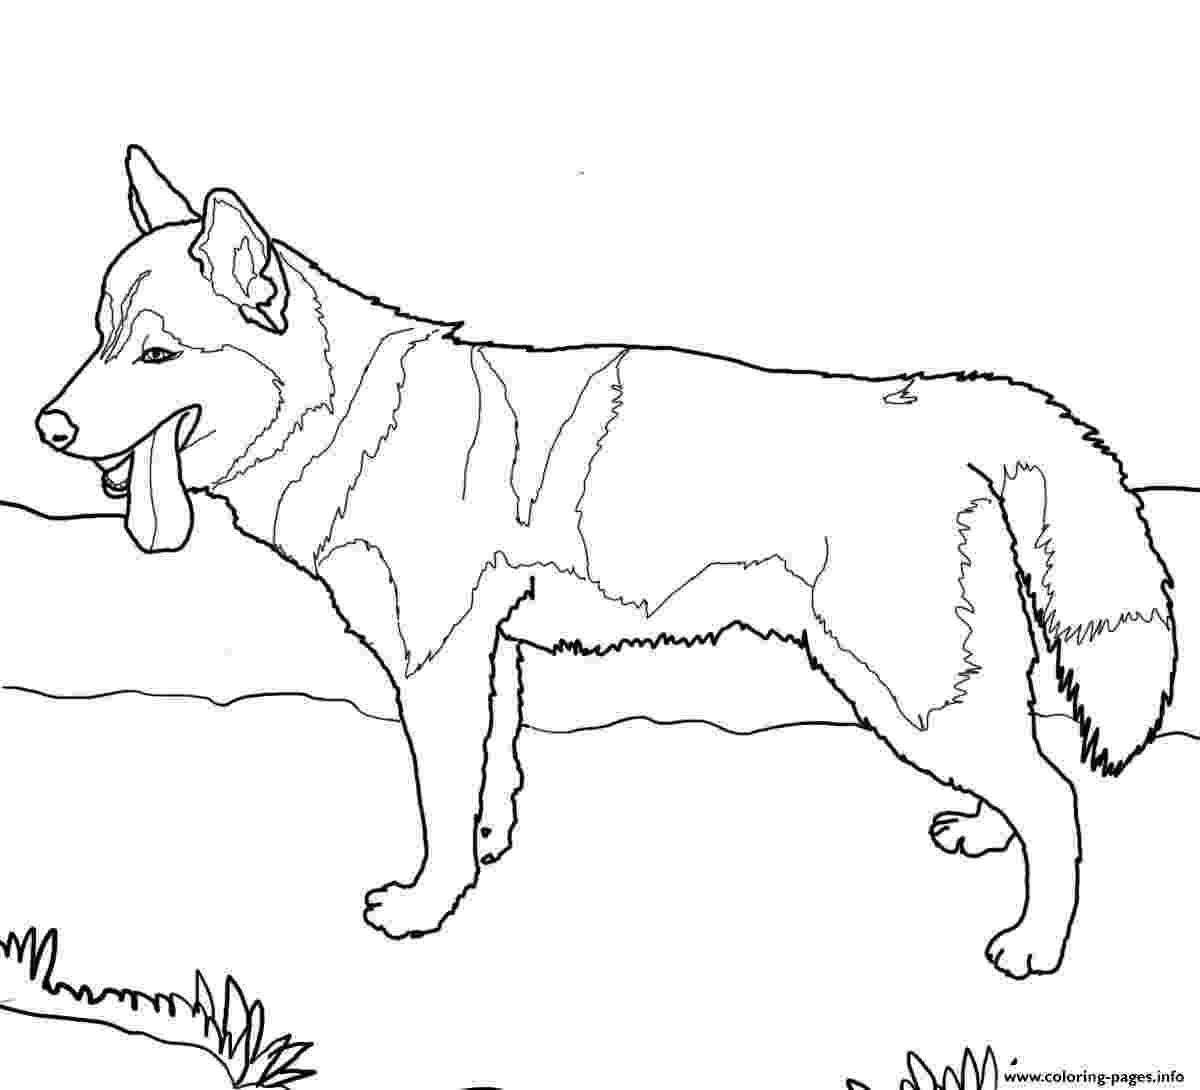 siberian husky coloring pages siberian husky dog coloring pages printable coloring pages siberian husky